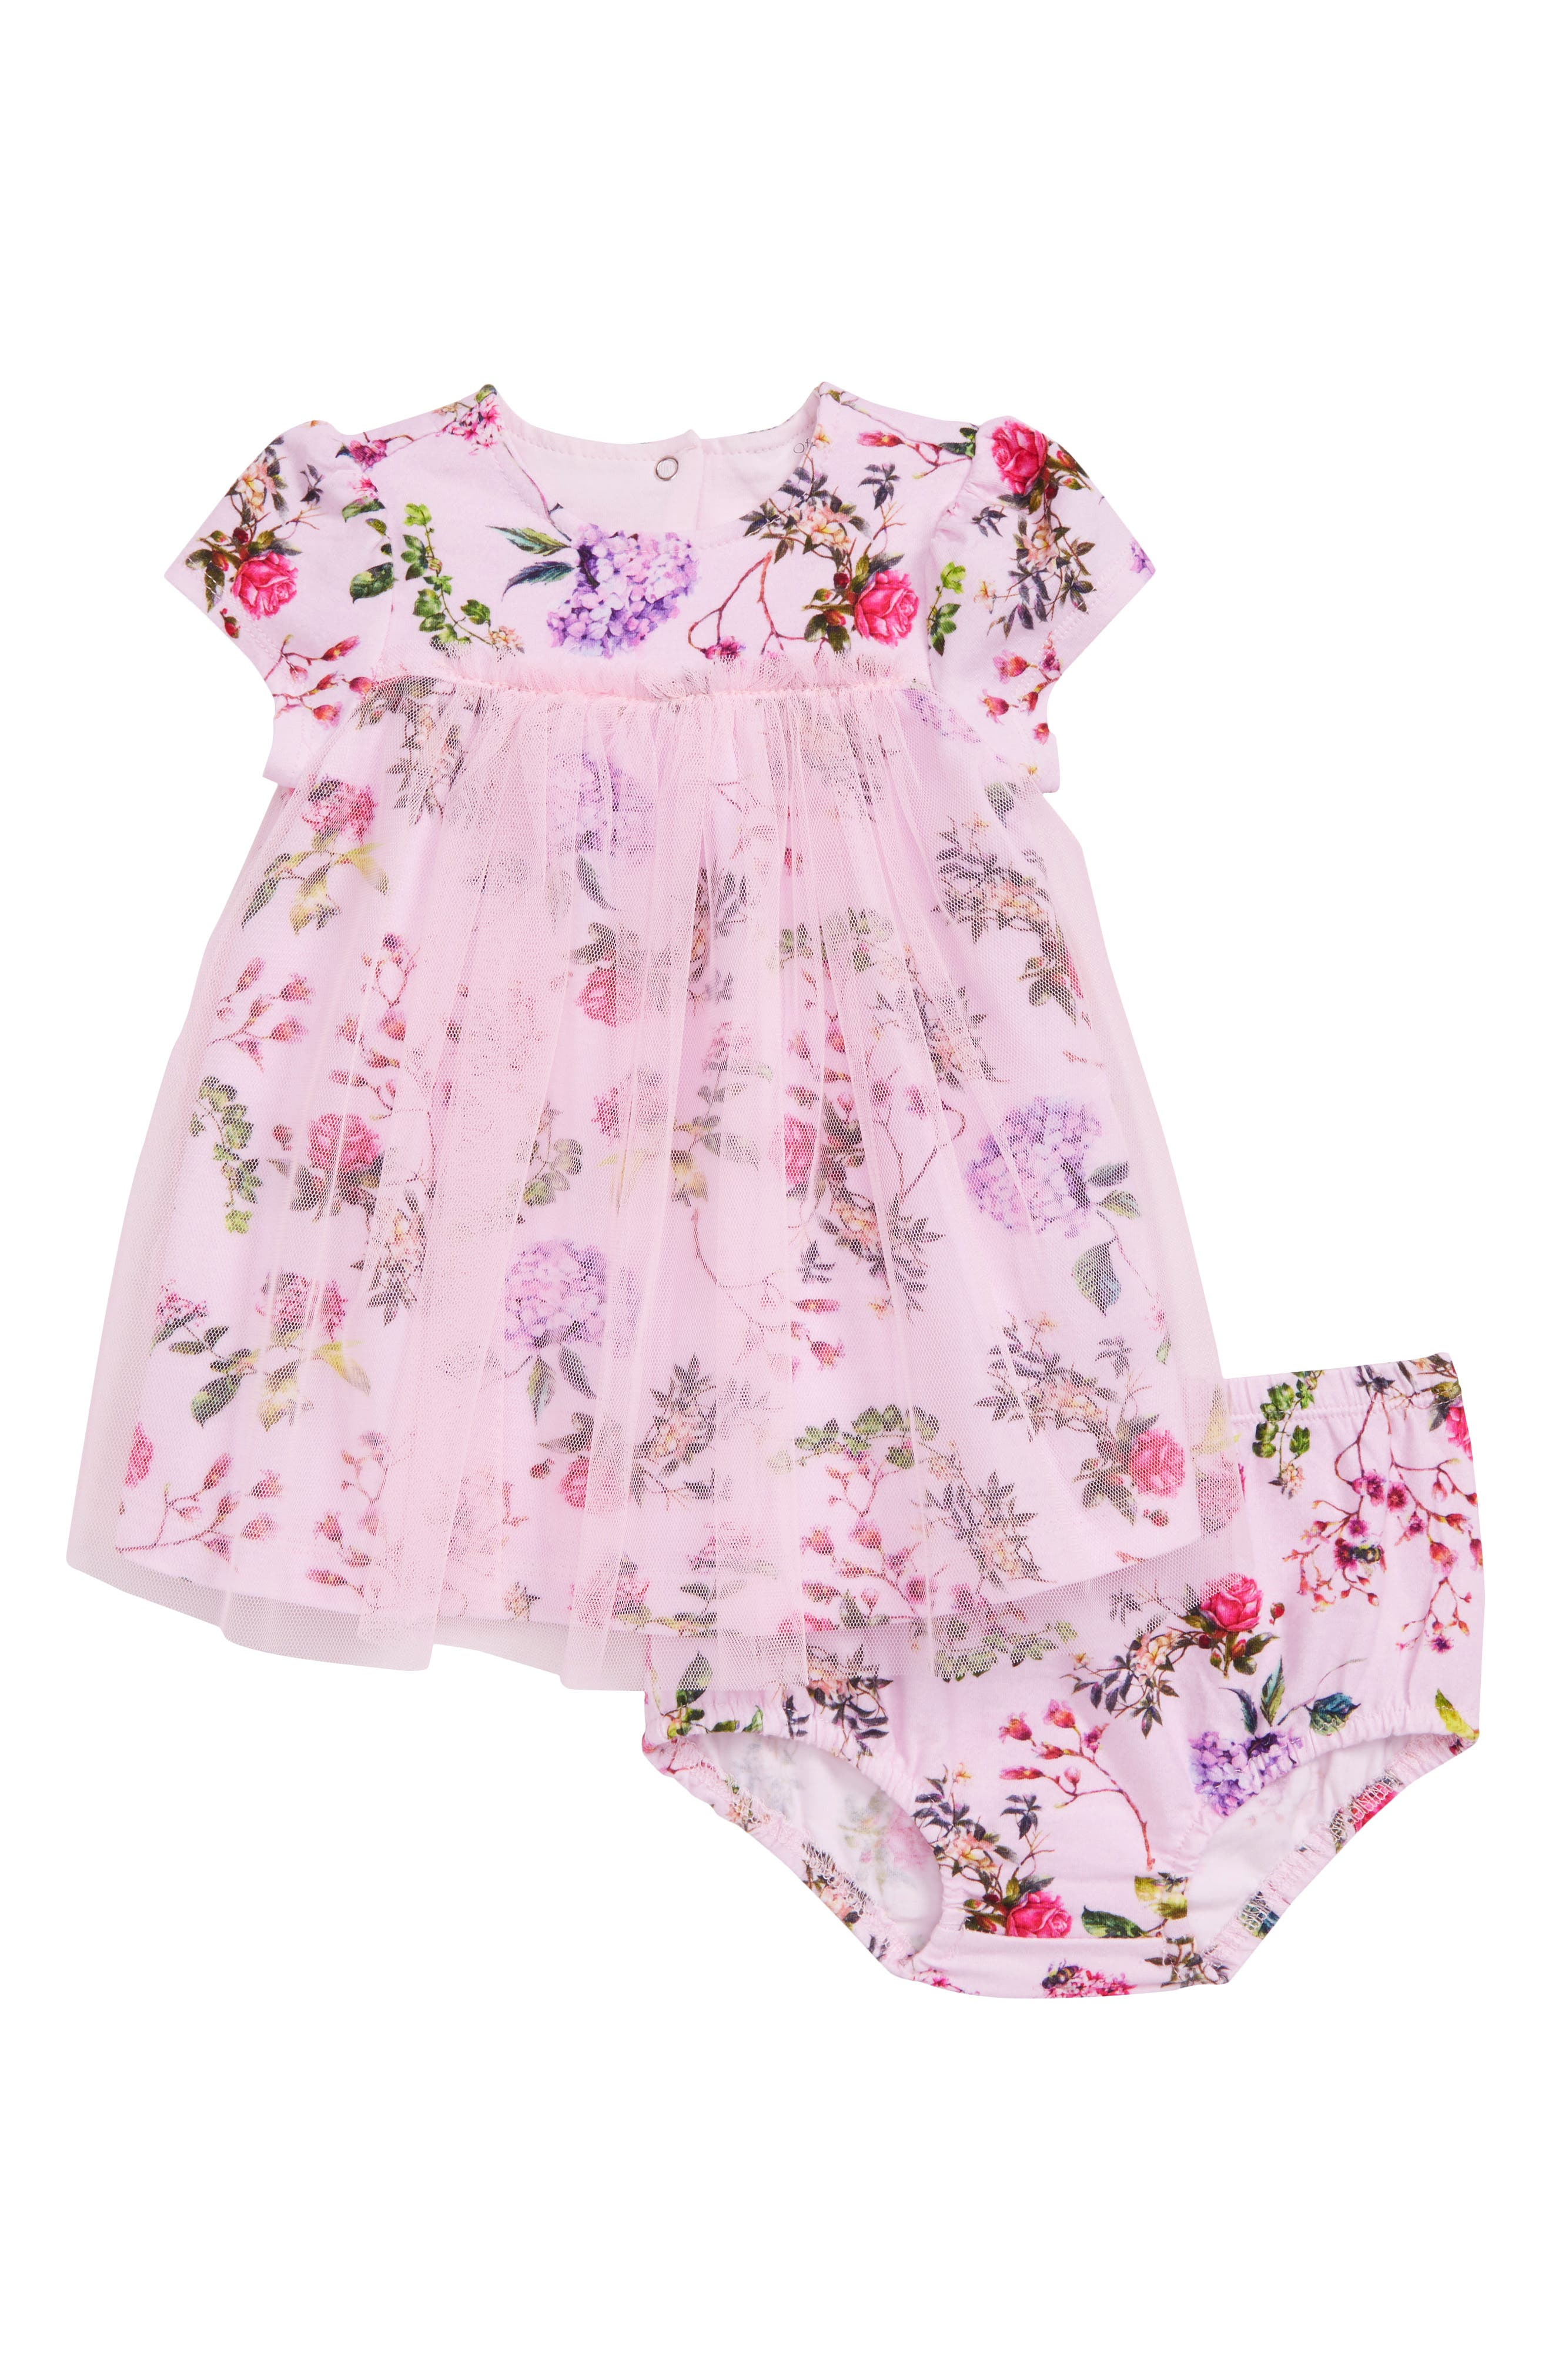 Botanical Blooms Tulle Dress,                         Main,                         color, Floral